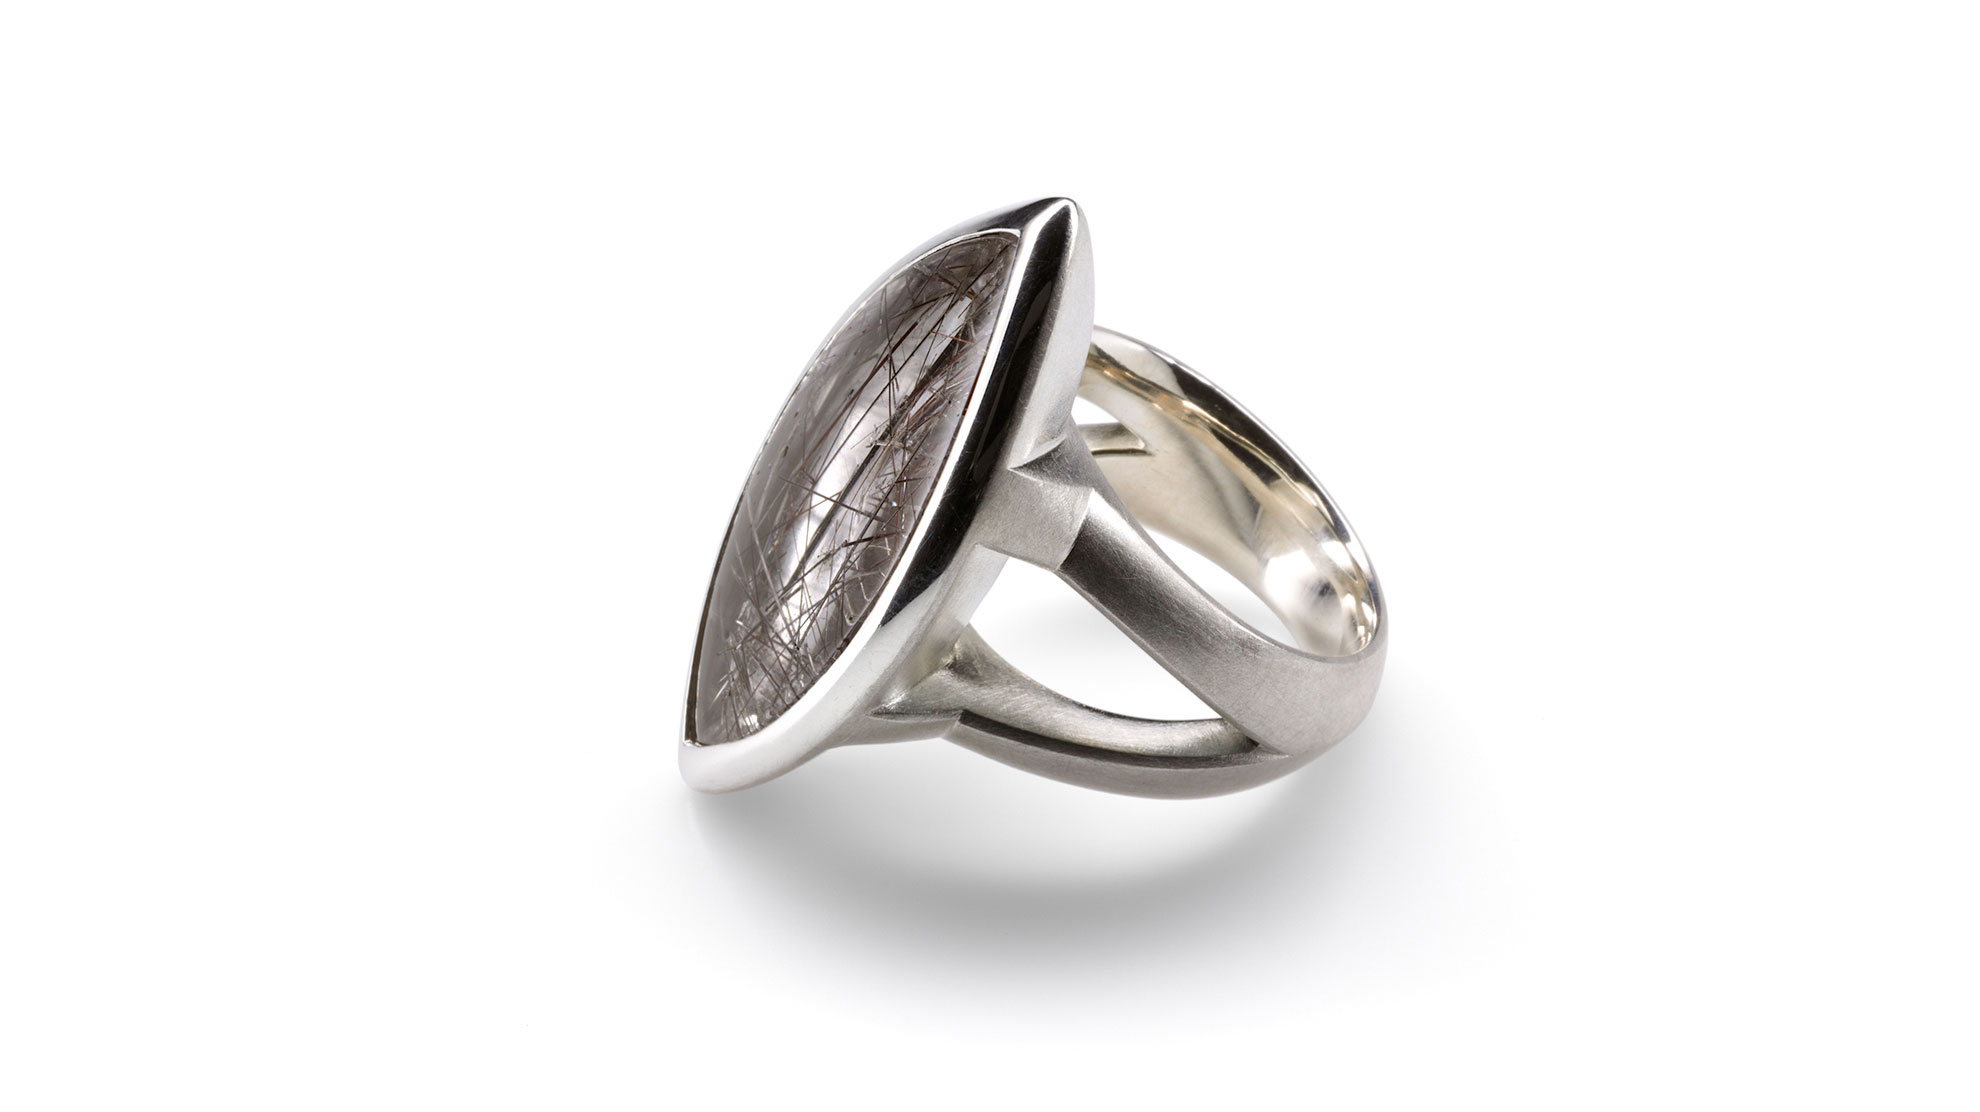 08 Ring Bergkristallnavette 925 Silber, Bergkristall mit roten Rutilnadeln